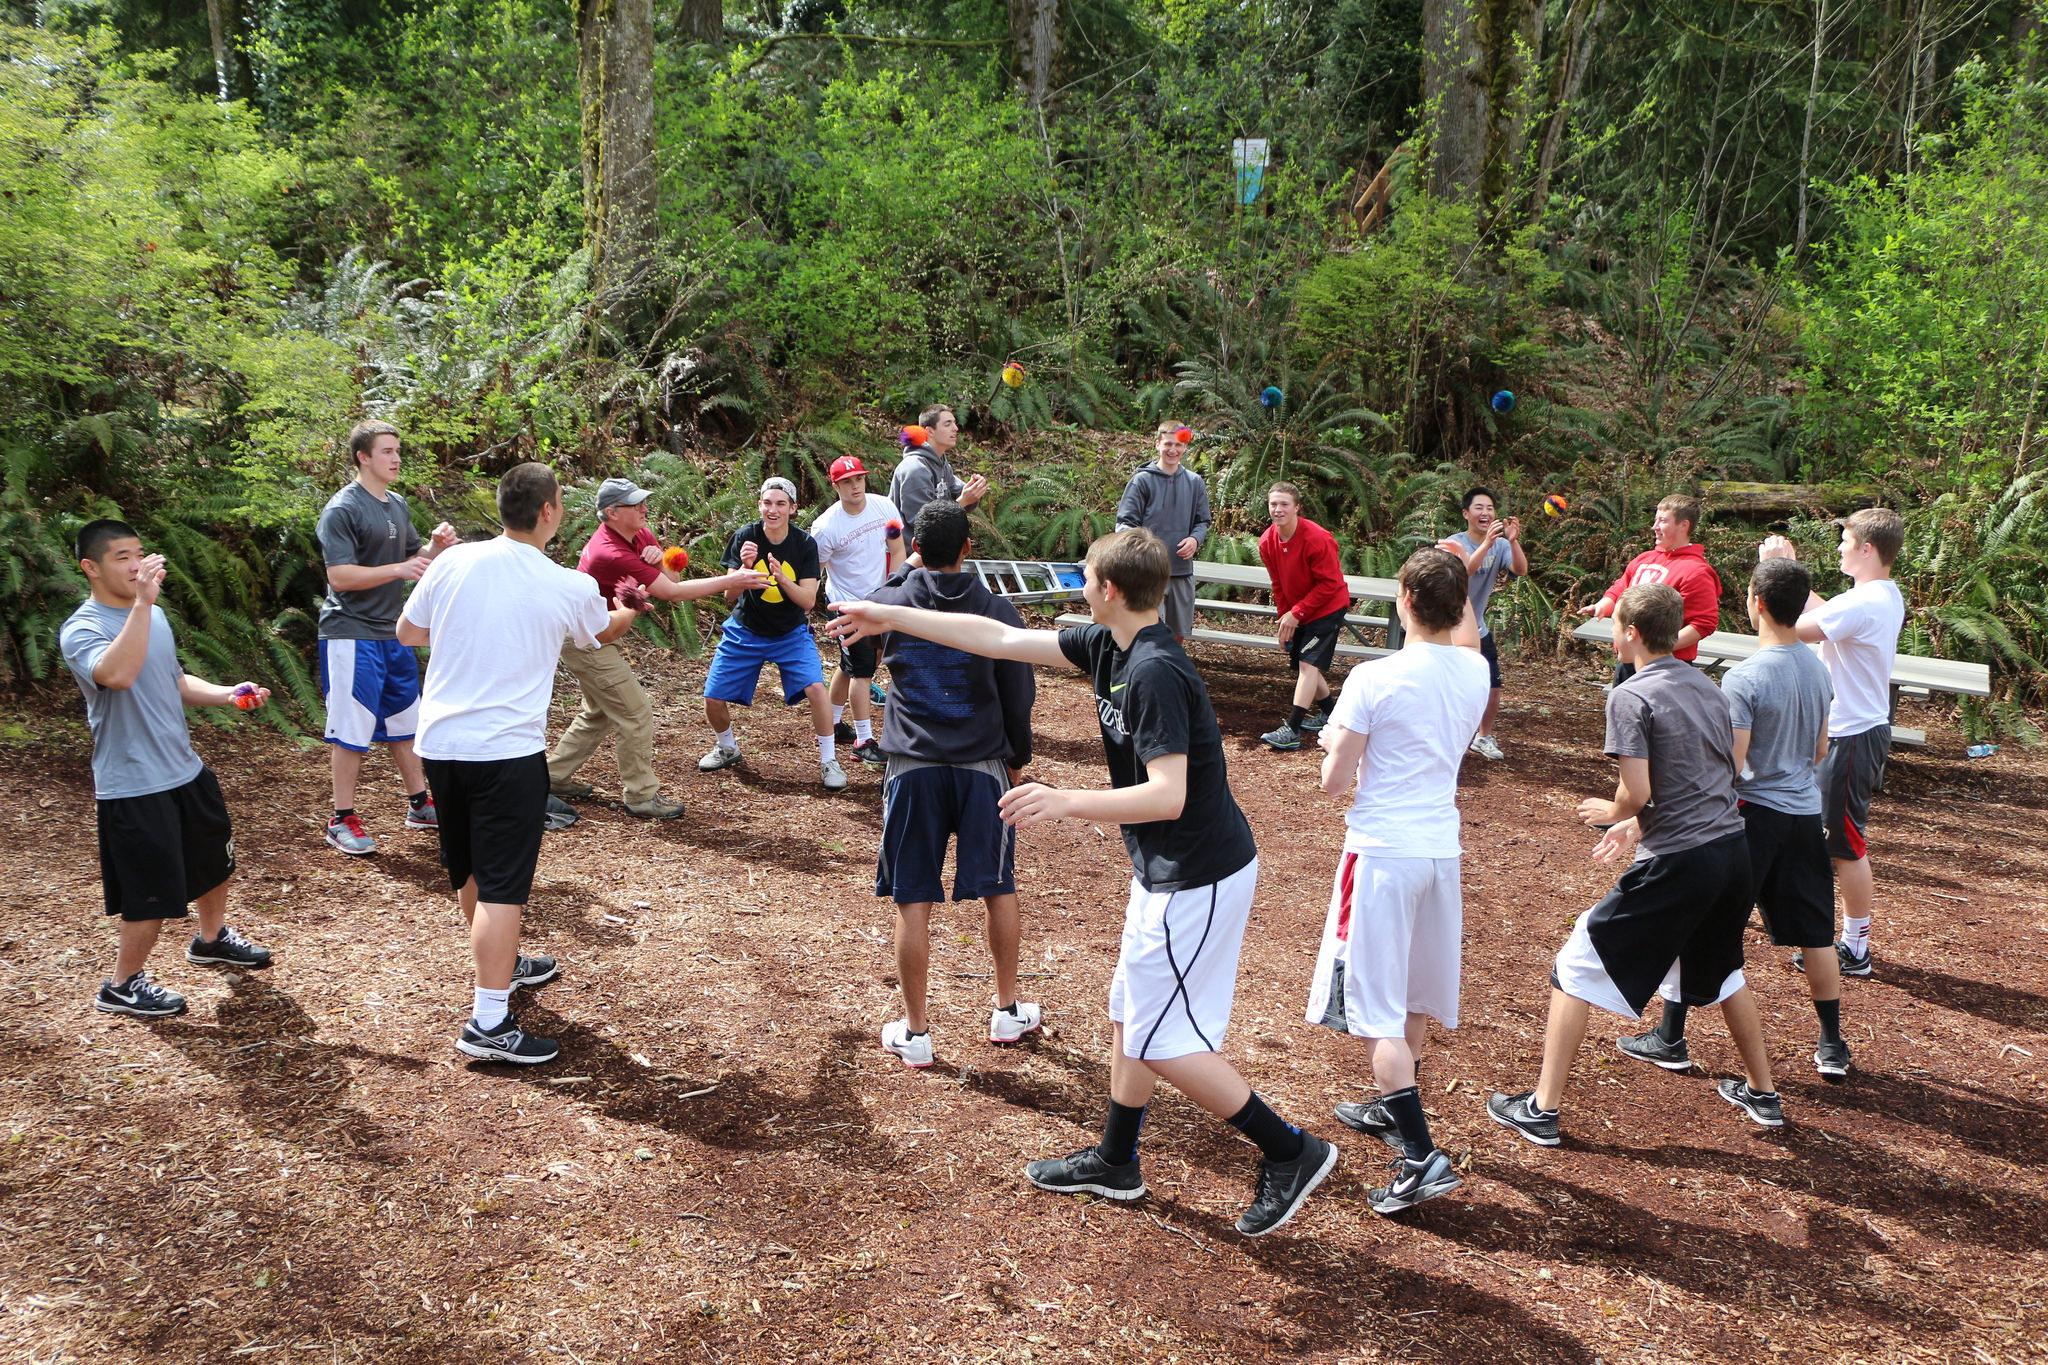 Group Juggle